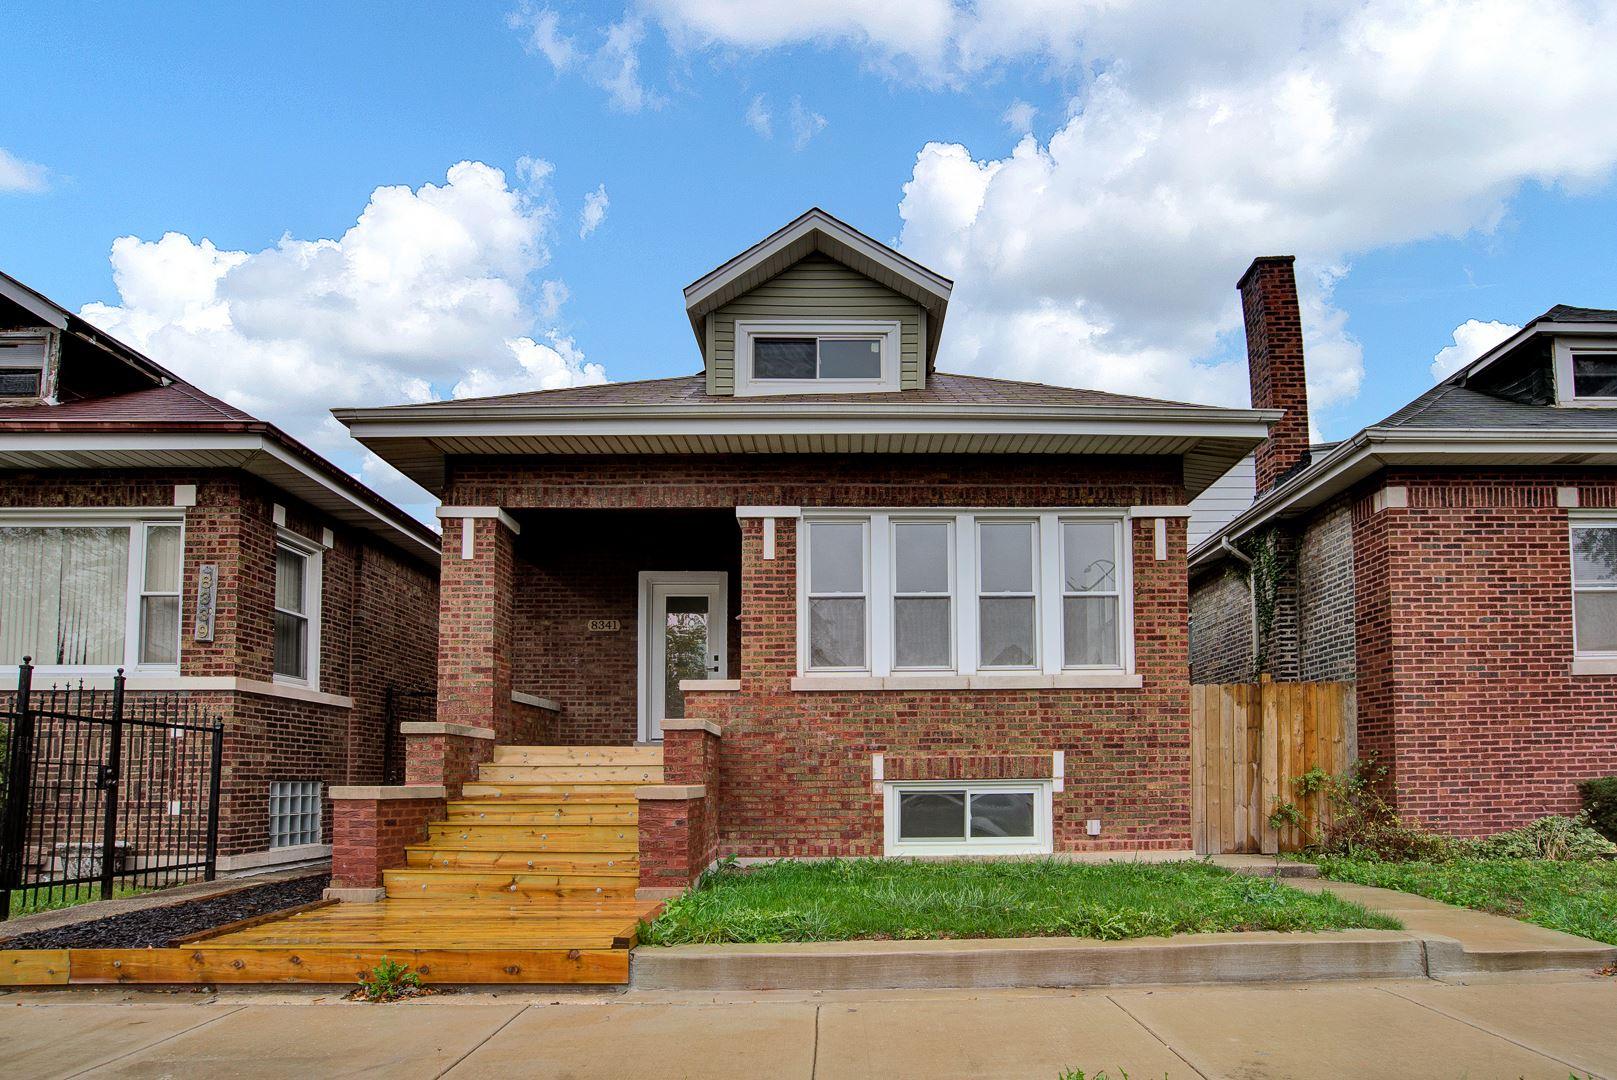 Photo for 8341 S Elizabeth Street, Chicago, IL 60620 (MLS # 11245528)